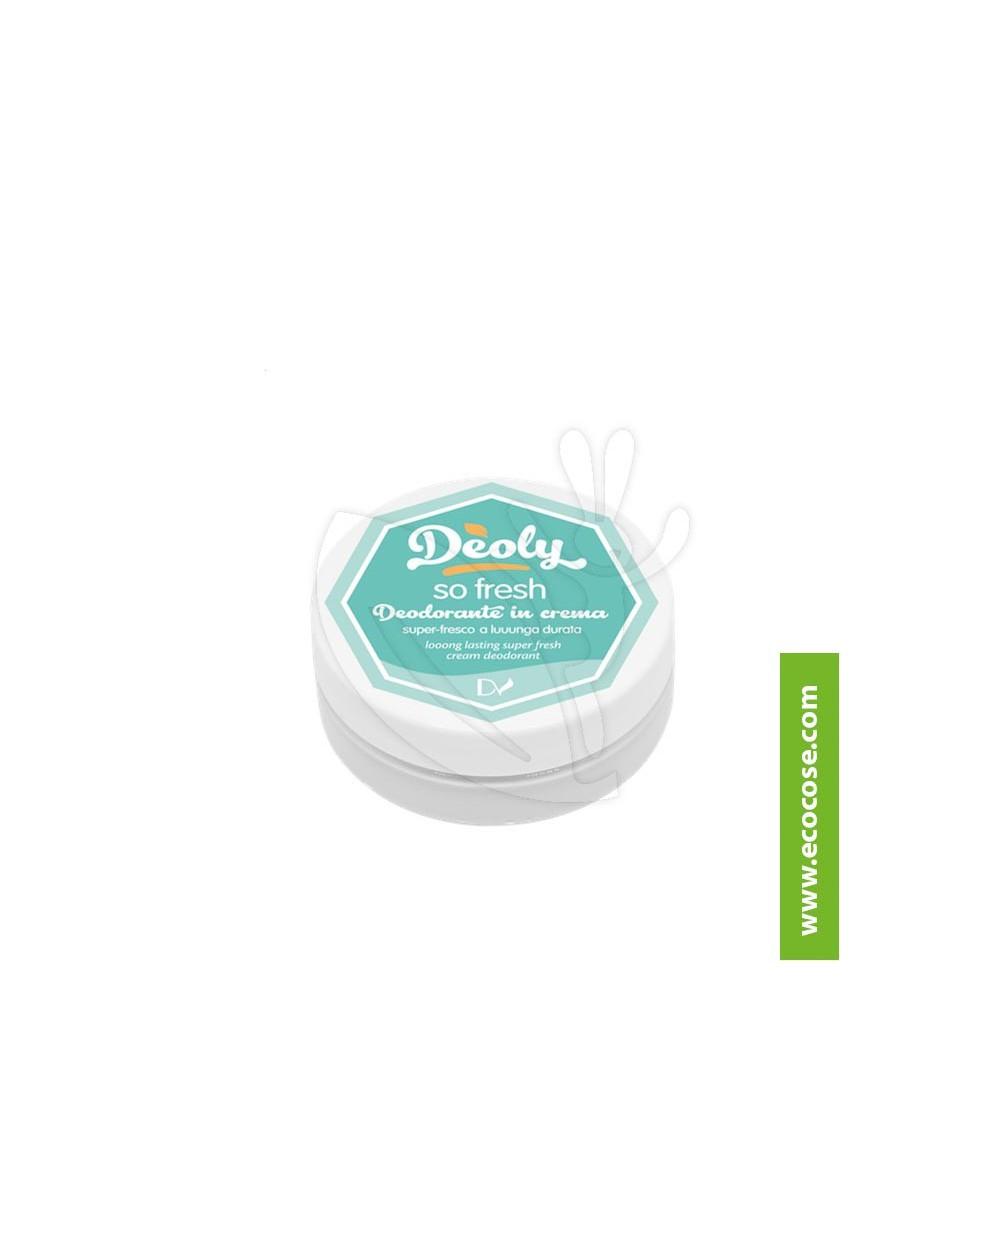 Deoly - Deodorante in crema So fresh